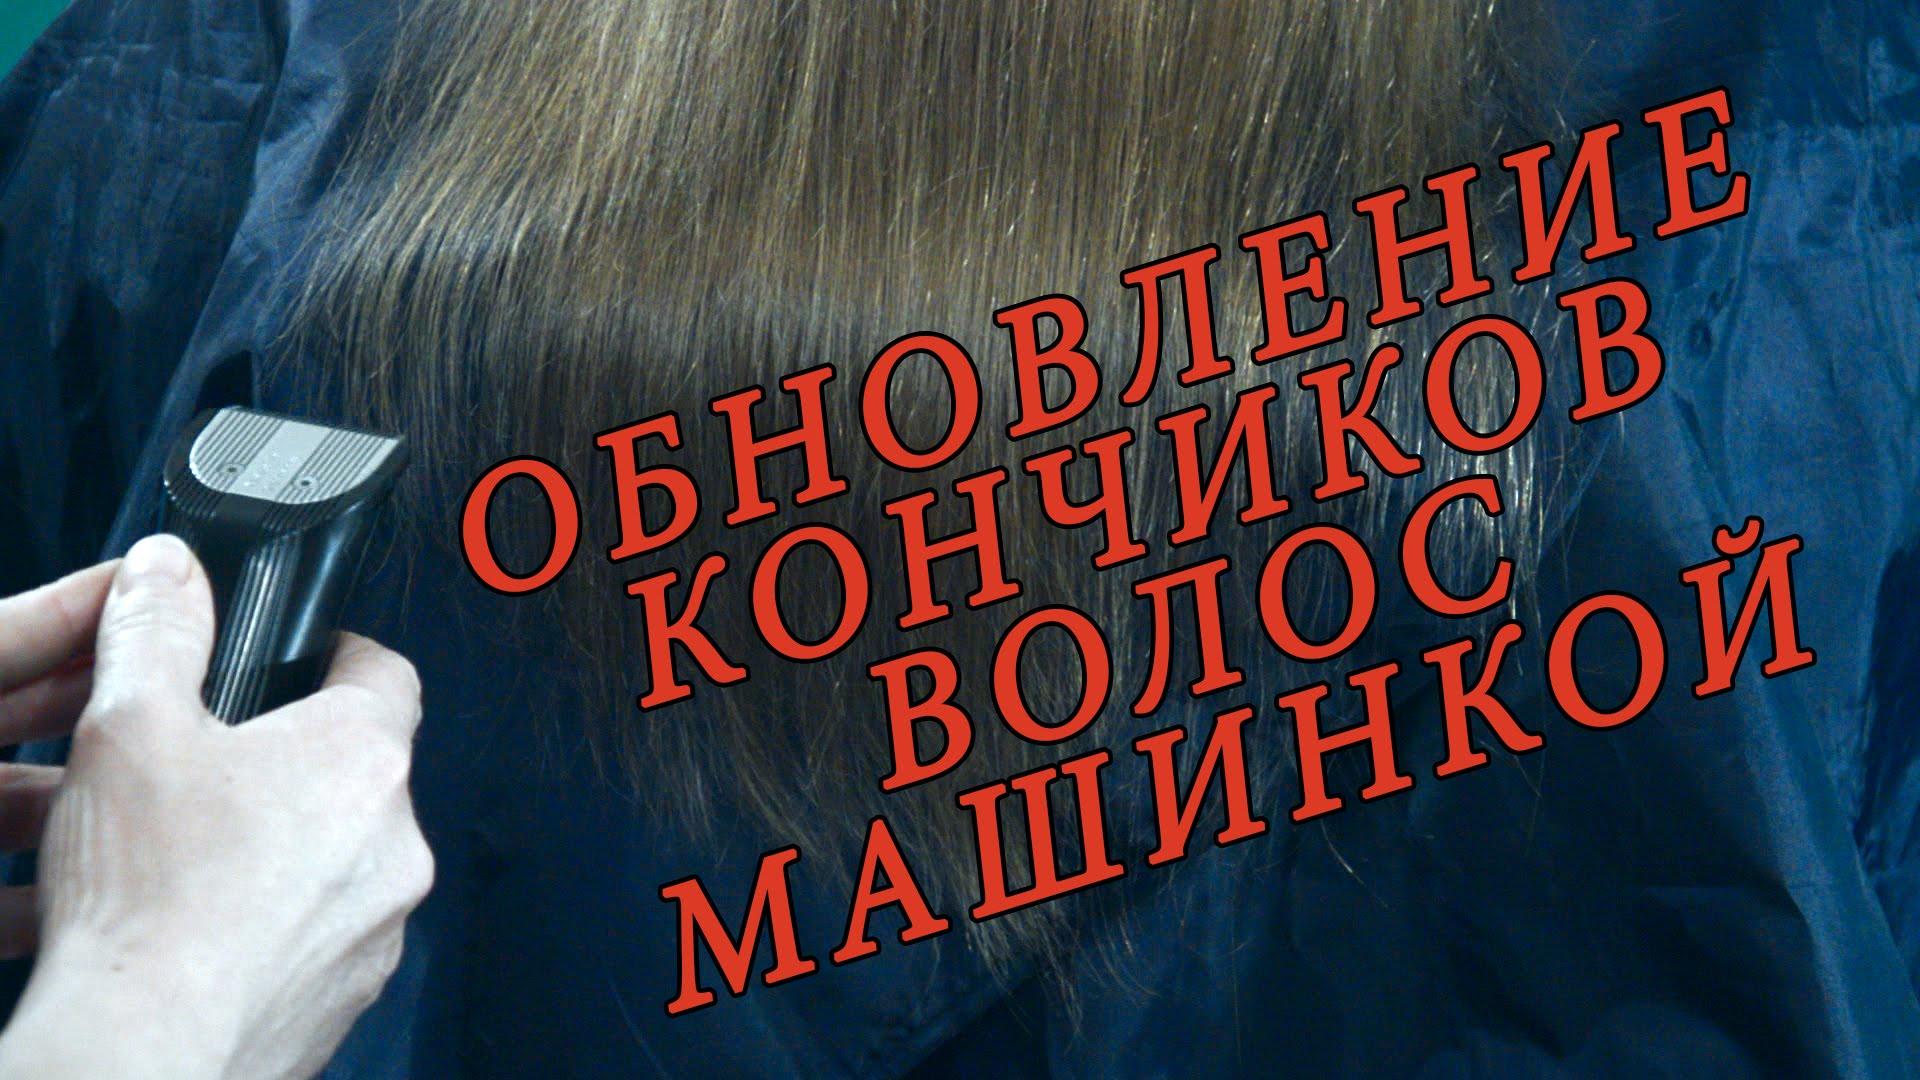 1529419851_maxresdefault.jpg